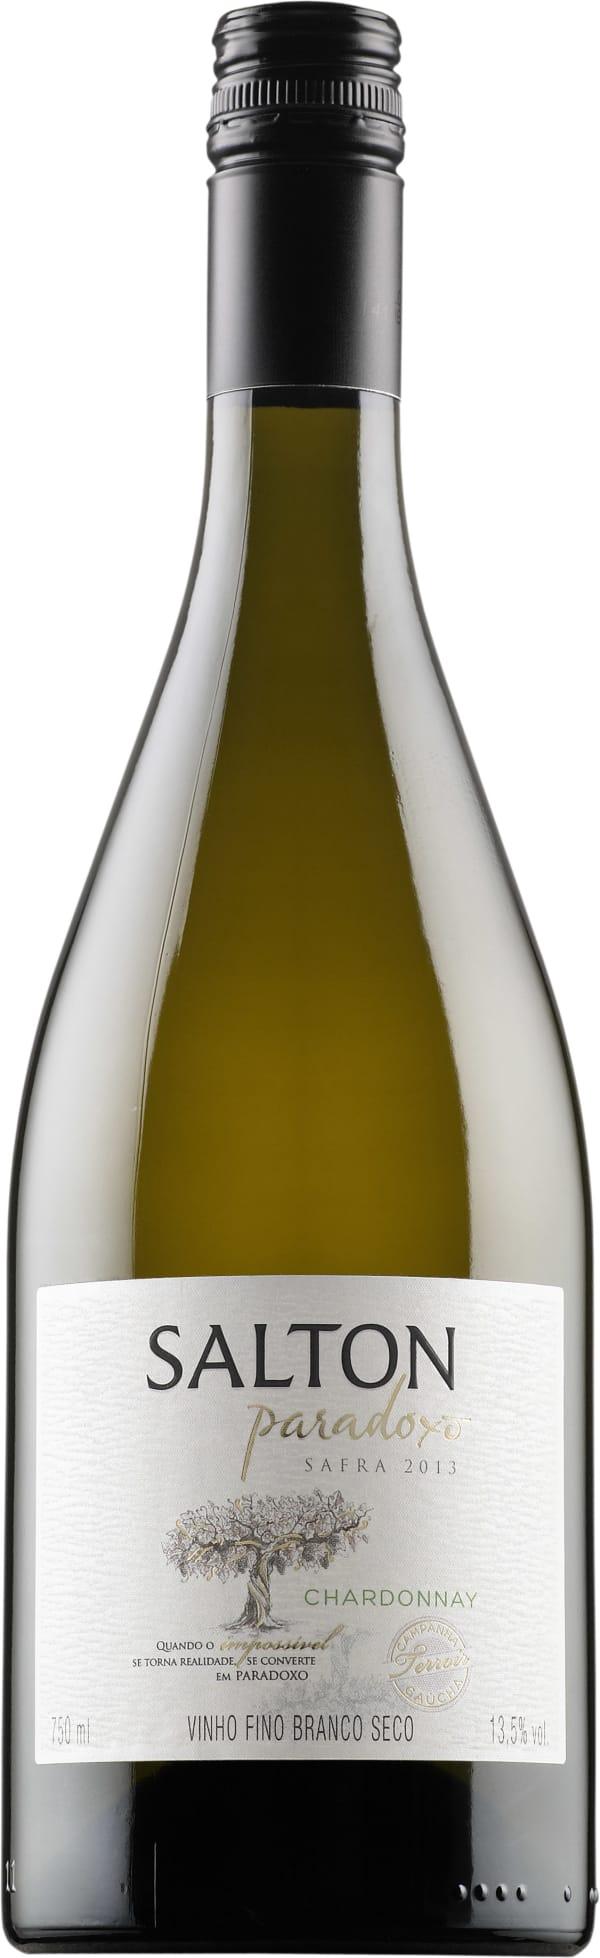 Salton Paradoxo Chardonnay 2013